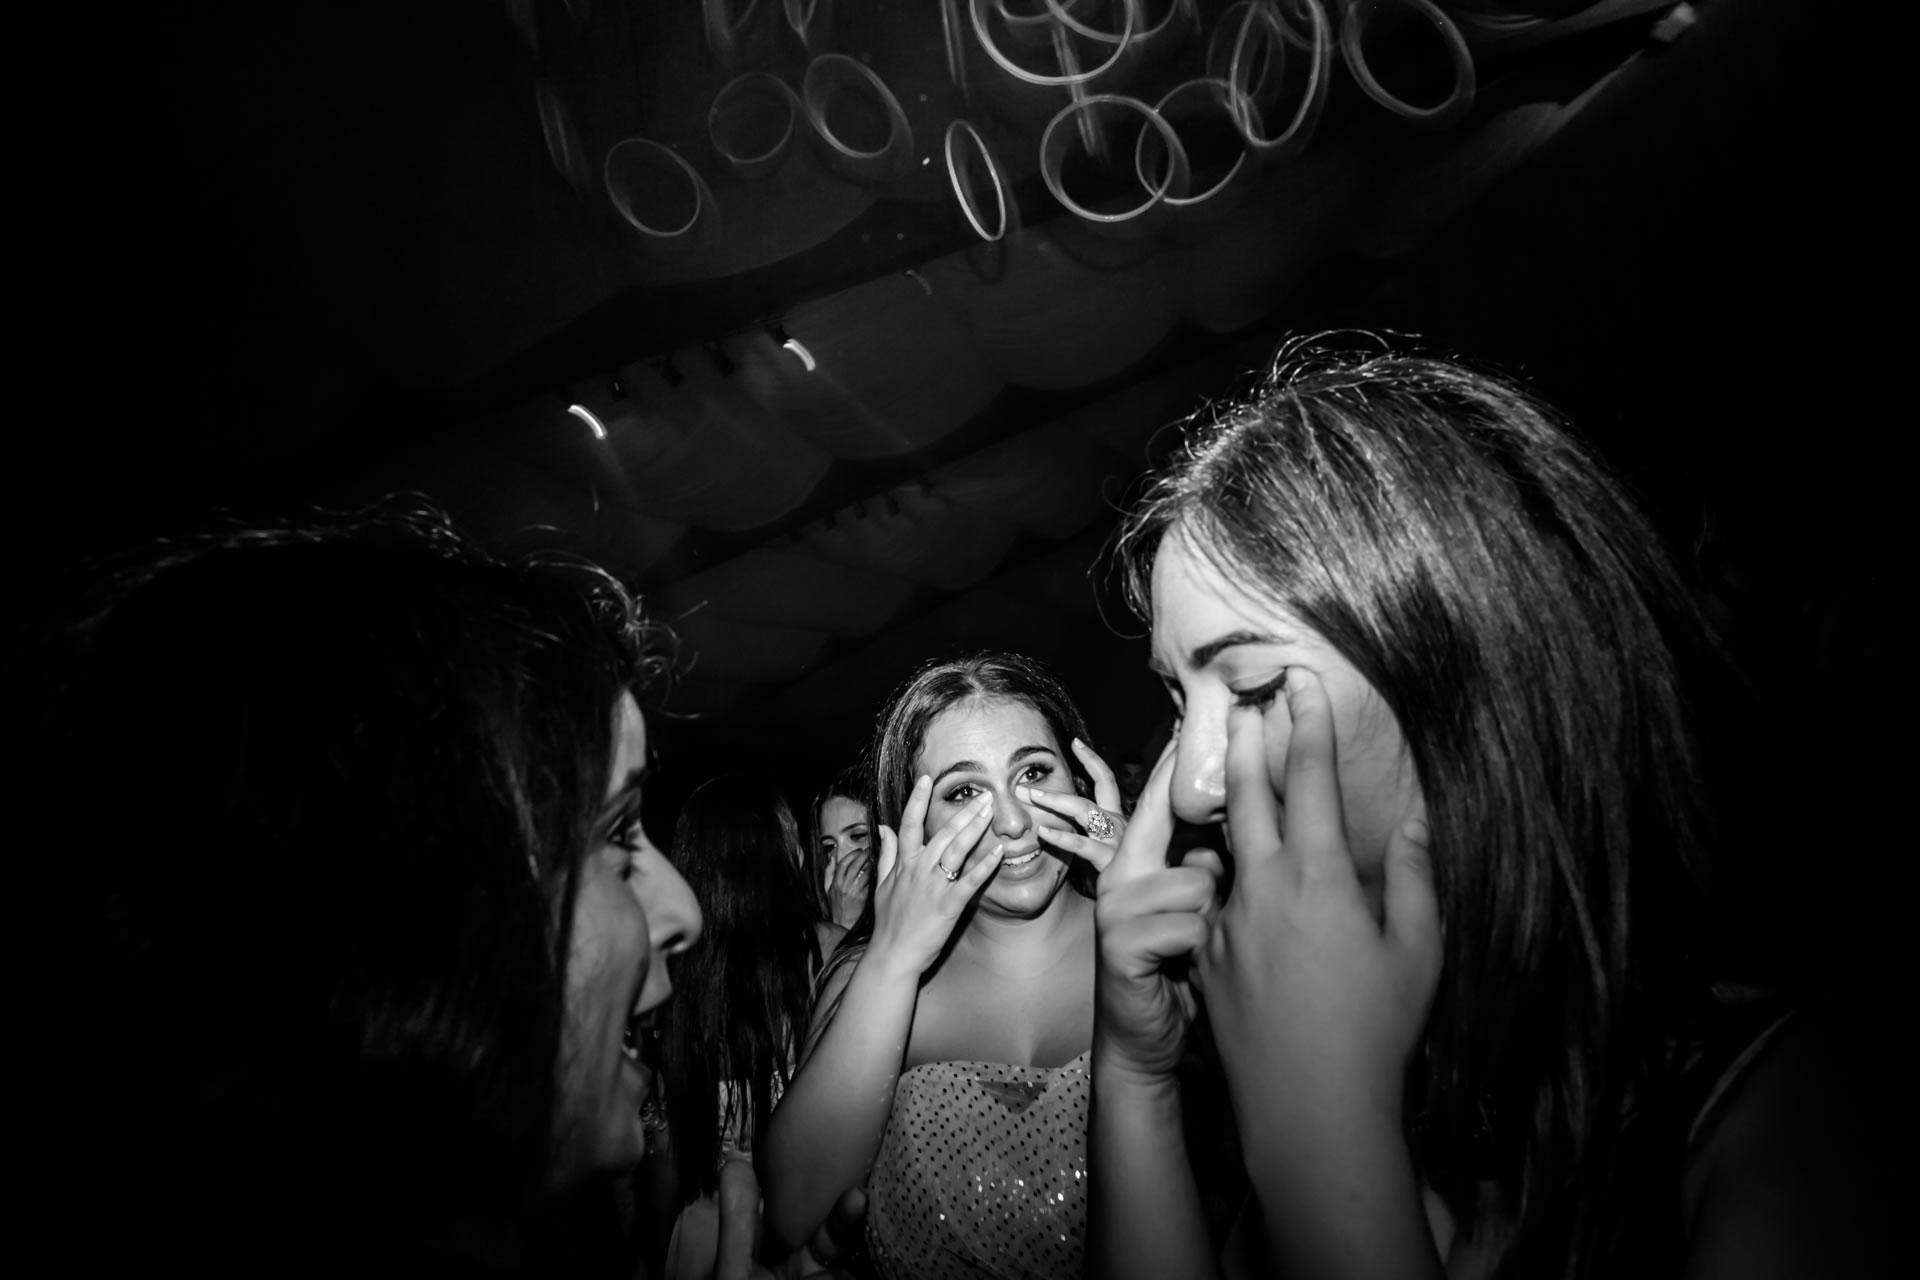 Tears - 92 :: Luxury wedding at Il Borro :: Luxury wedding photography - 91 :: Tears - 92